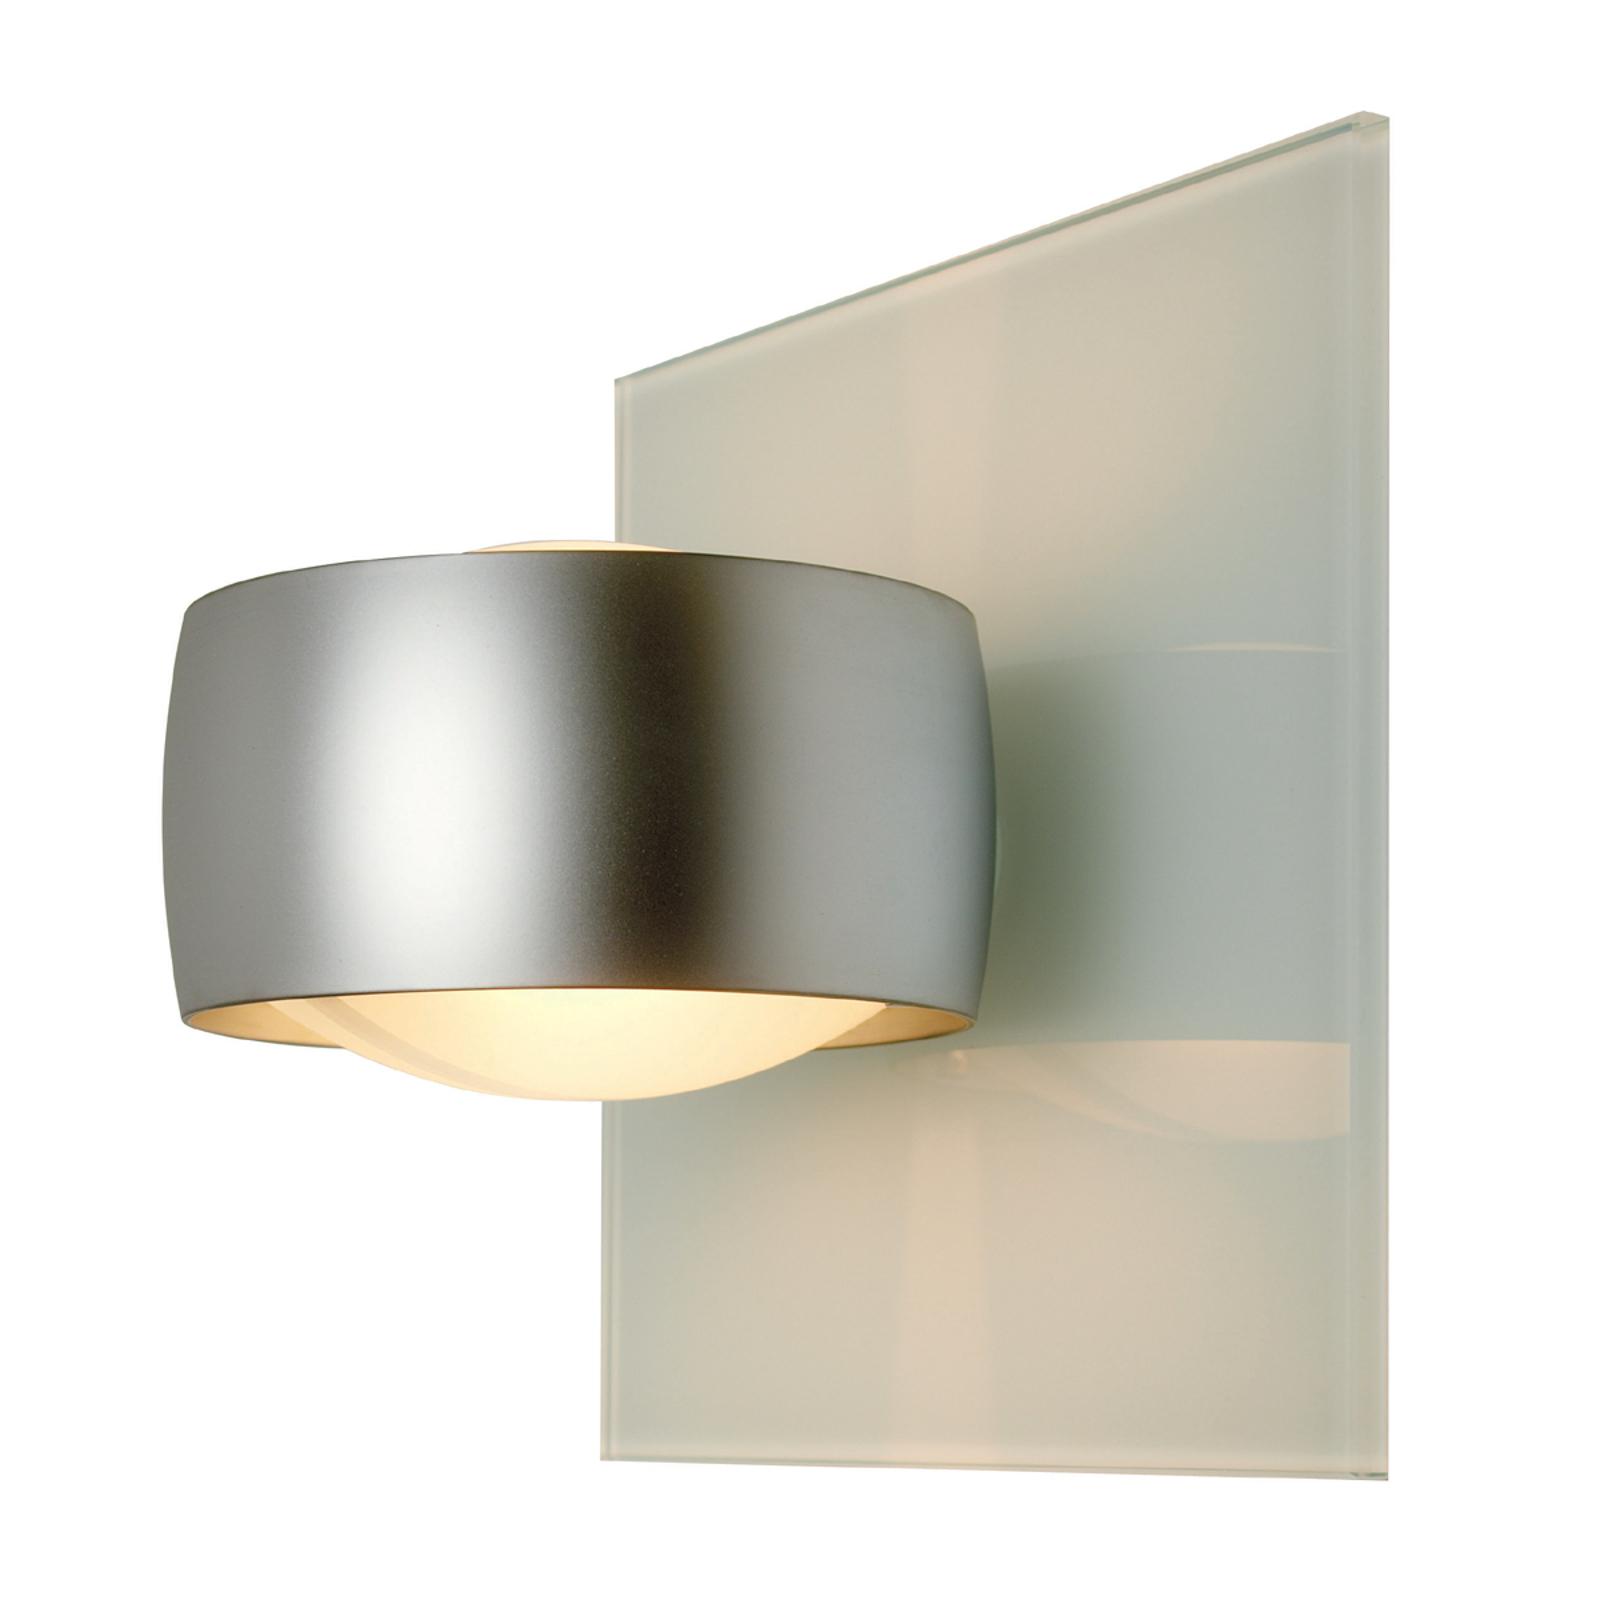 Decorativa applique GRACE UNLIMITED bianco/argento